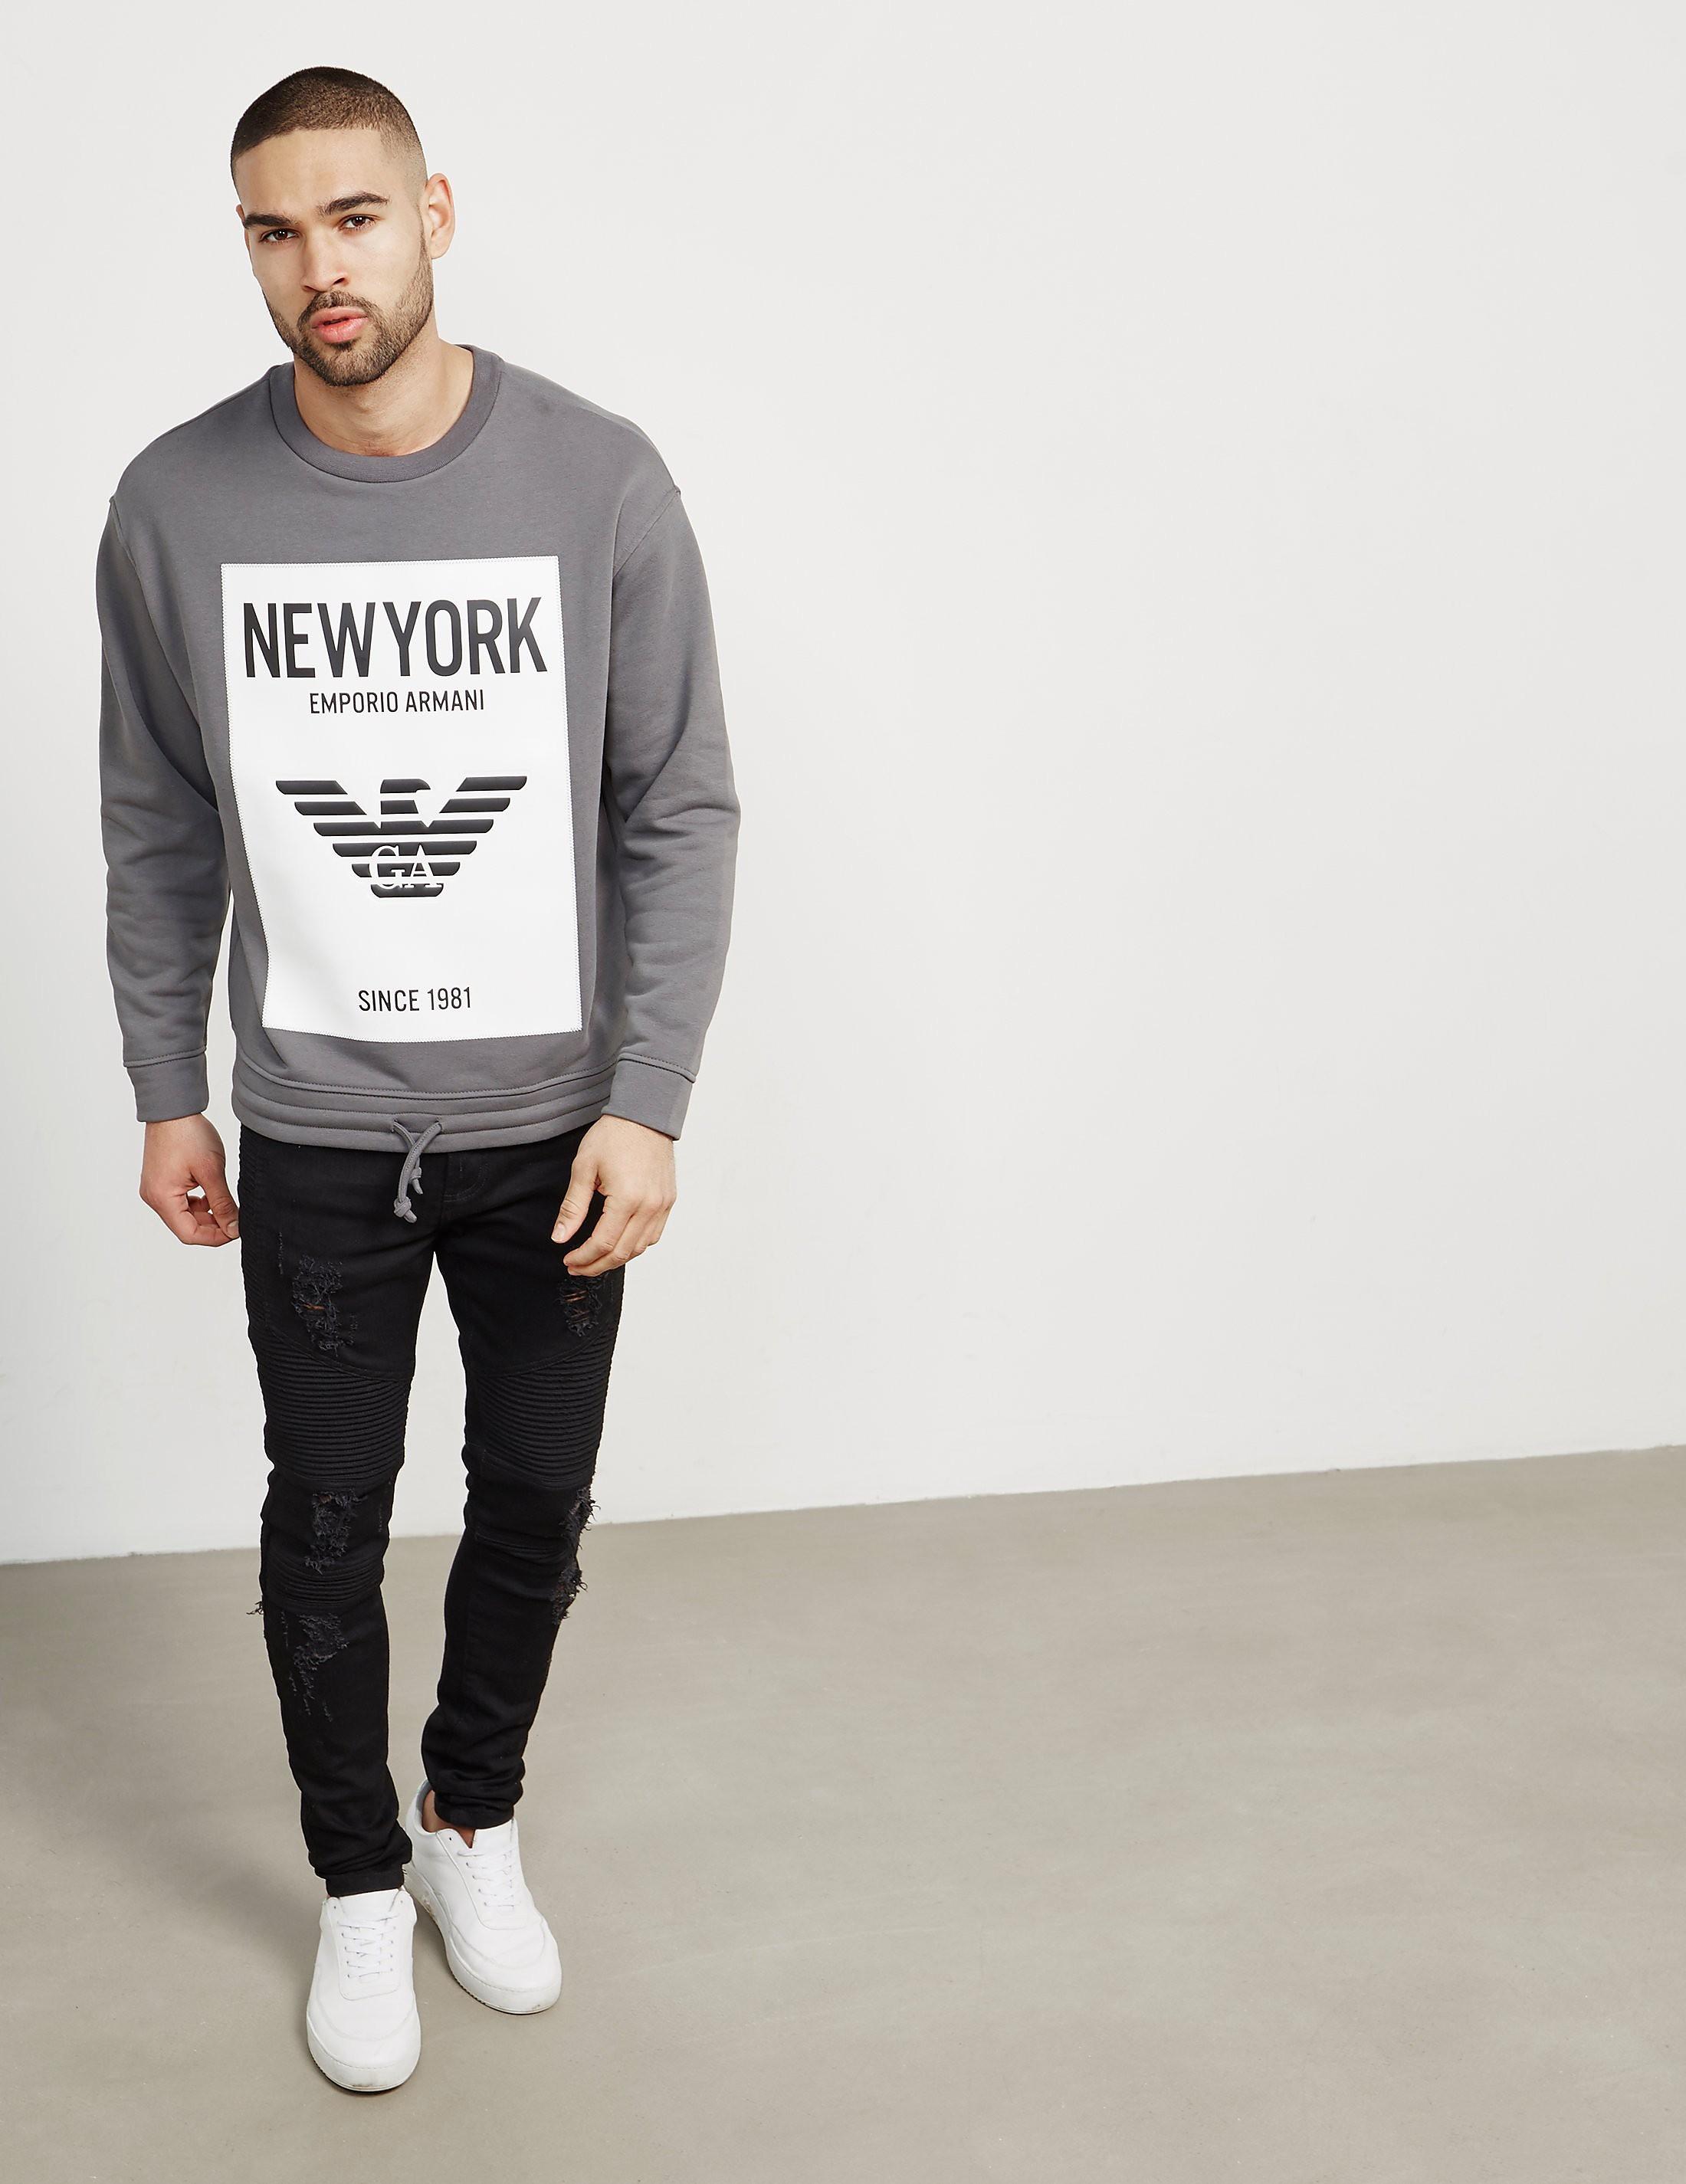 Emporio Armani New York Sweatshirt - Online Exclusive